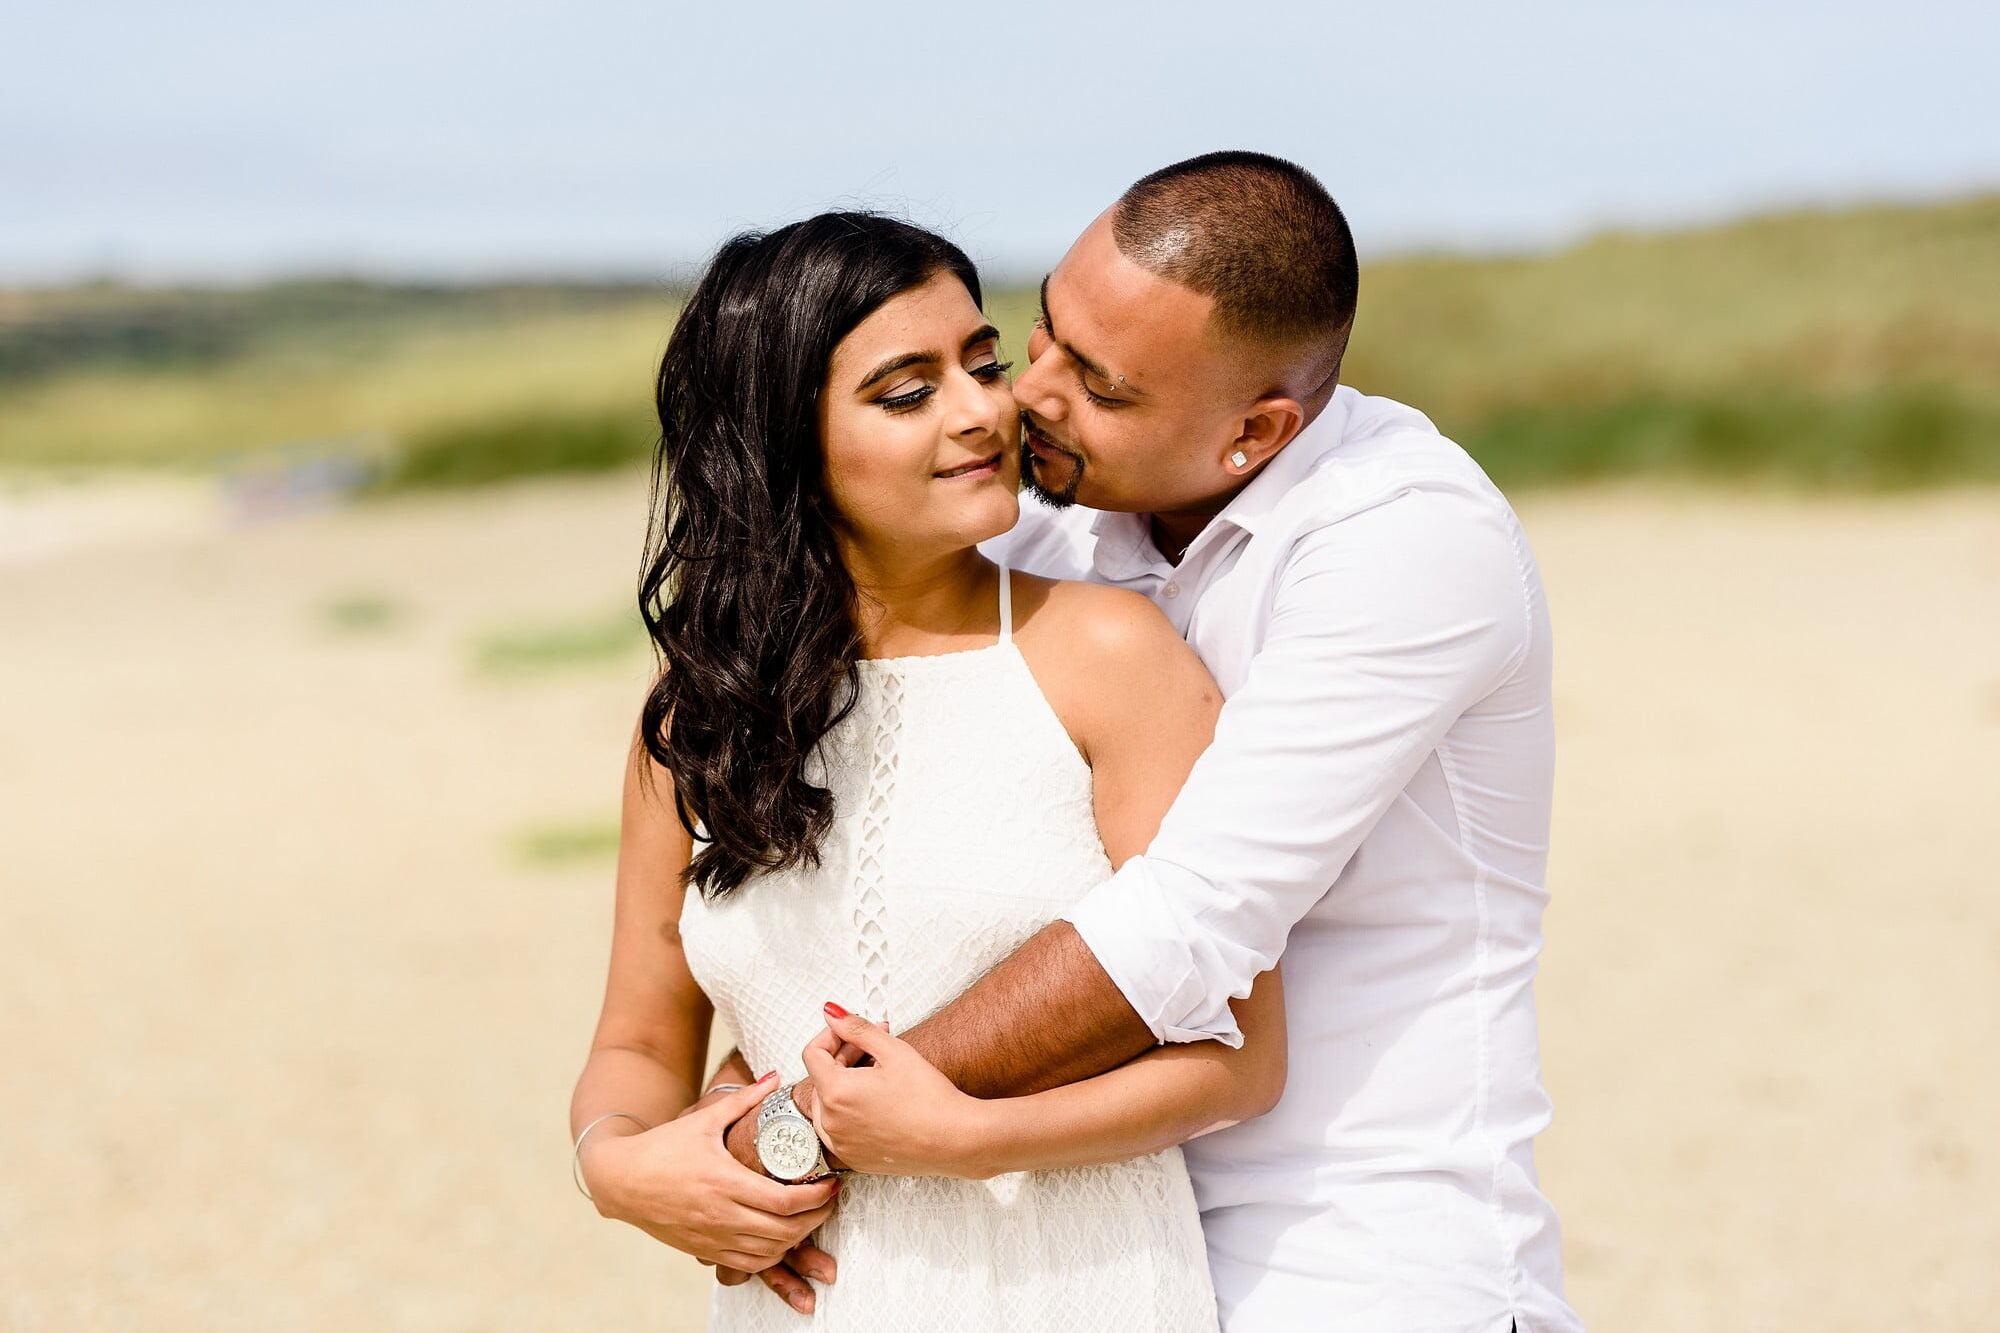 st-michaels-mount-wedding-proposal-4